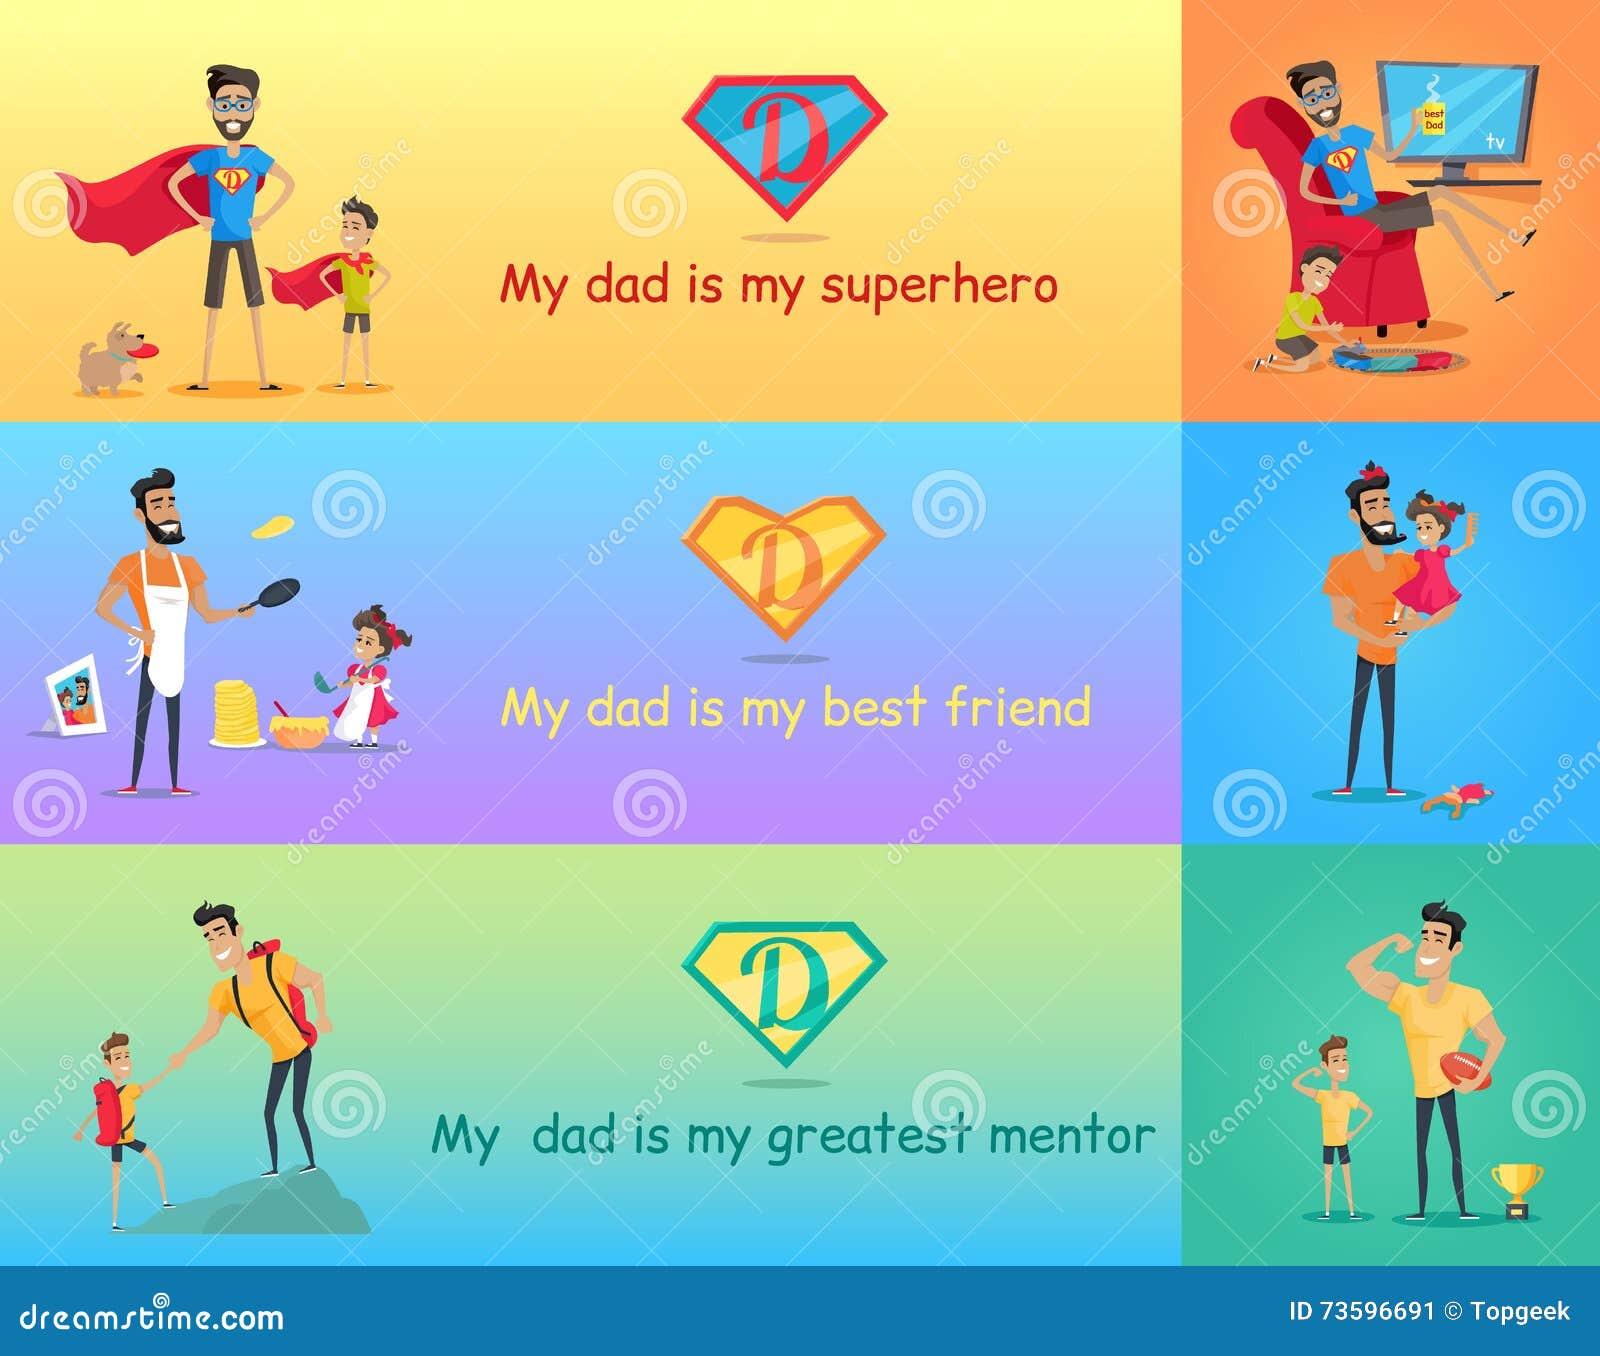 My Father-My Mentor - Poem by Gajanan Mishra